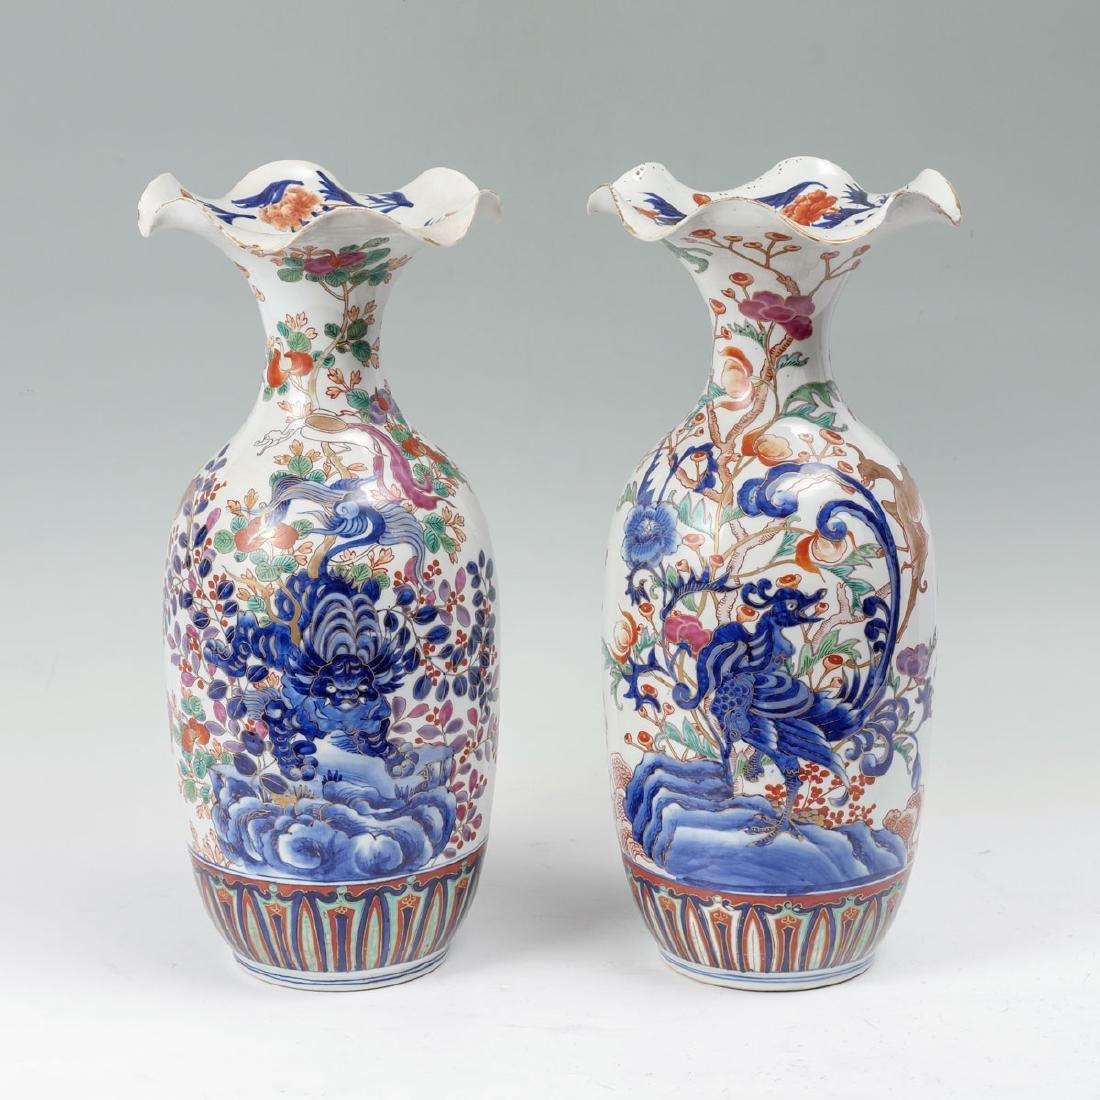 2 JAPANESE MEIJI PERIOD SCALLOPED RIM VASES